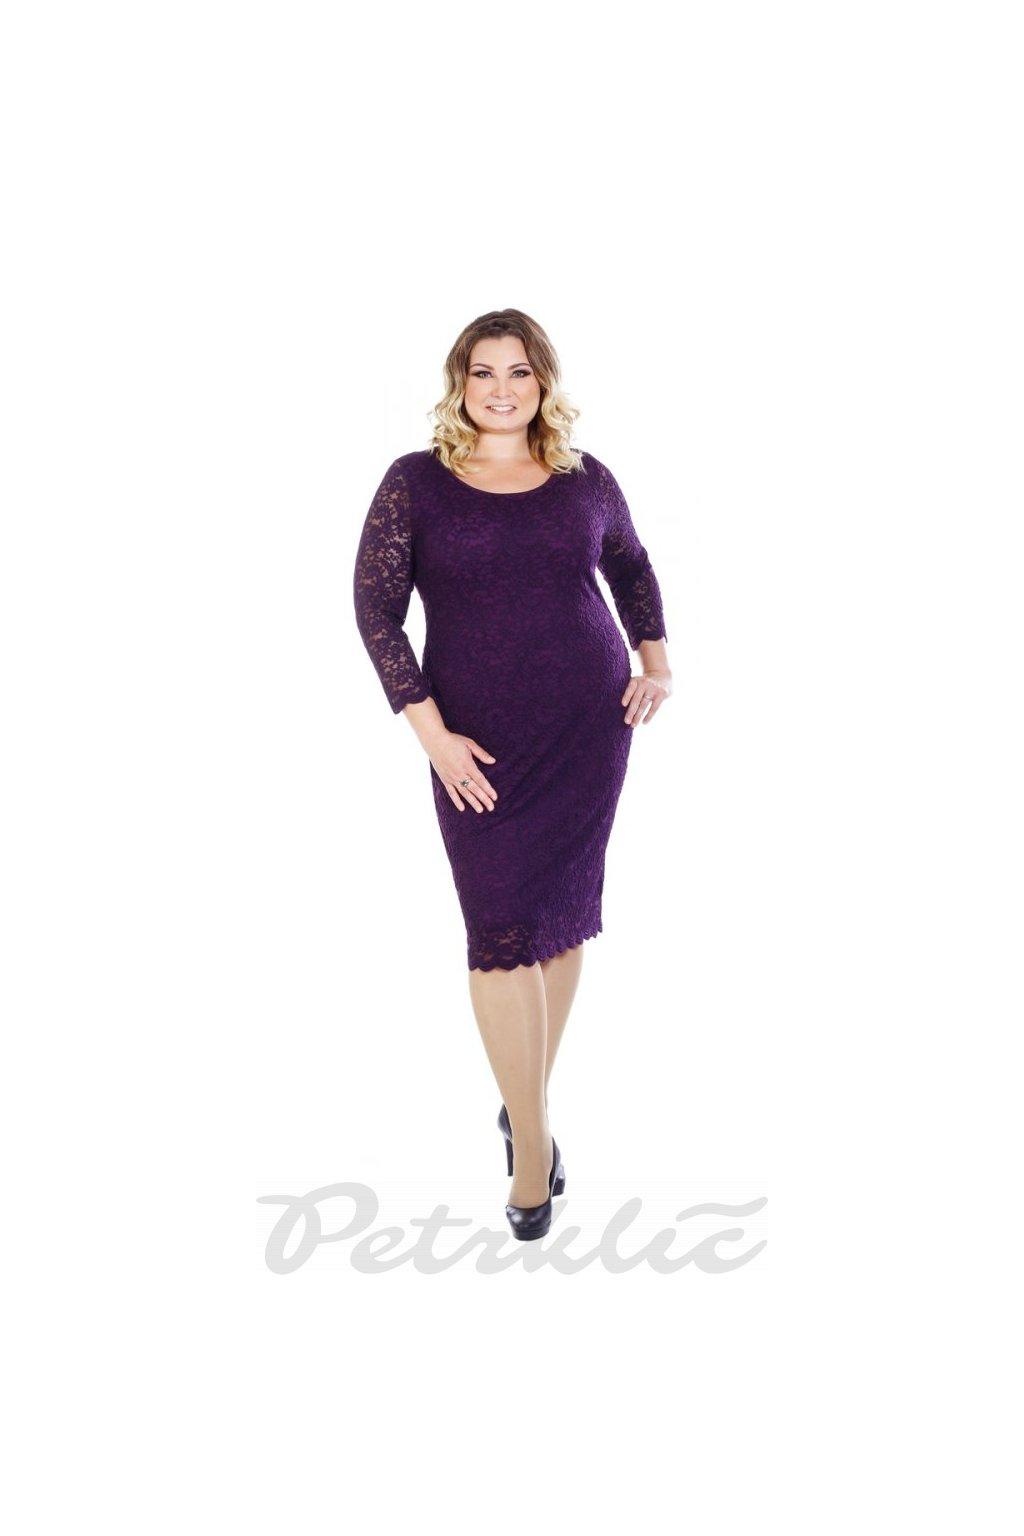 TAMARA - šaty 3/4 rukáv 110 - 115 cm